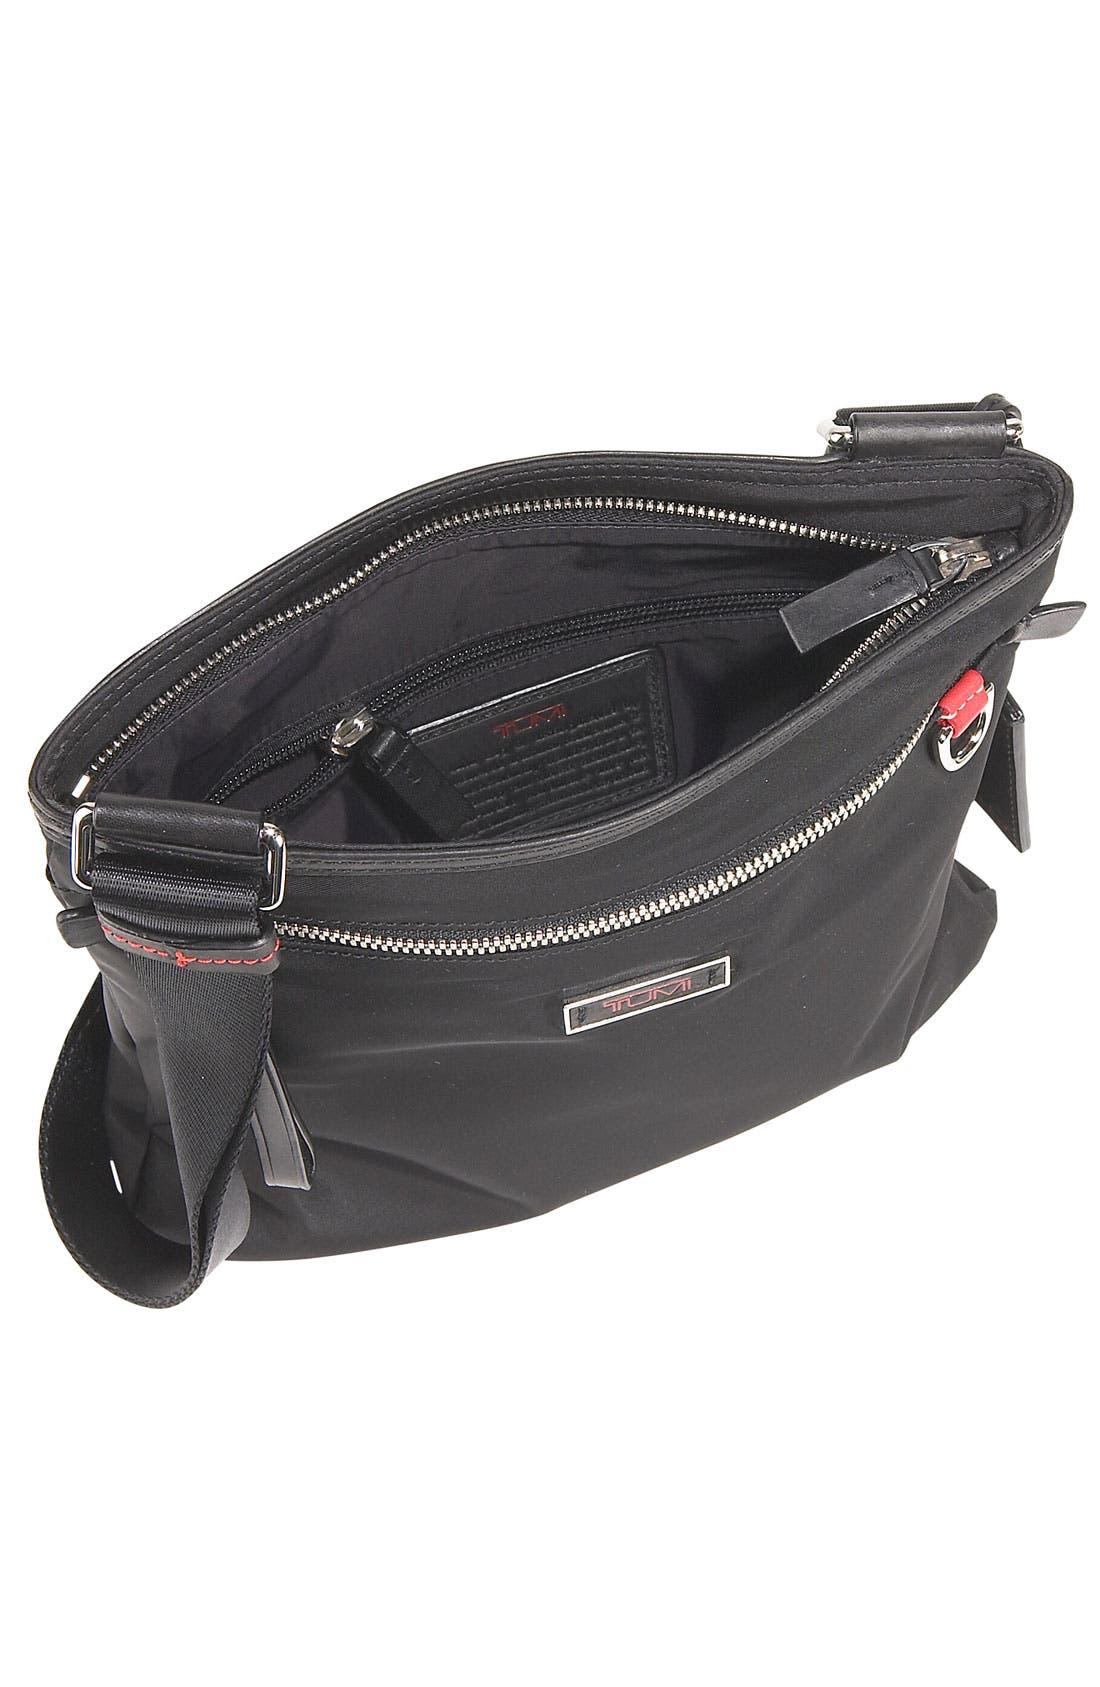 'Voyager - Capri' Crossbody Bag,                             Alternate thumbnail 5, color,                             001